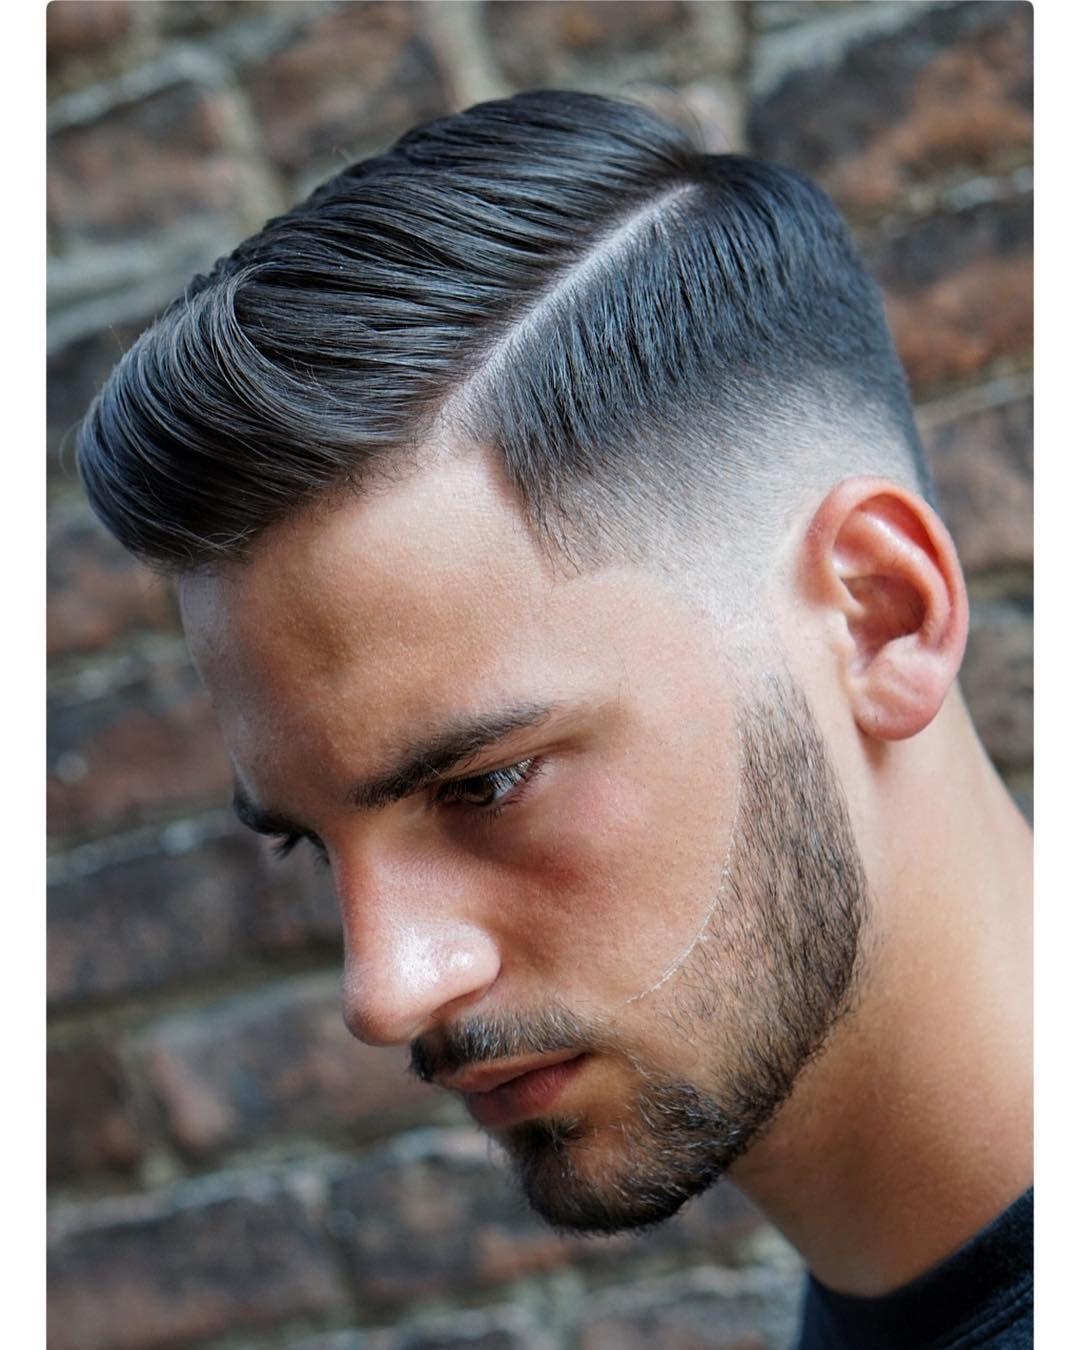 habib hair cutting price